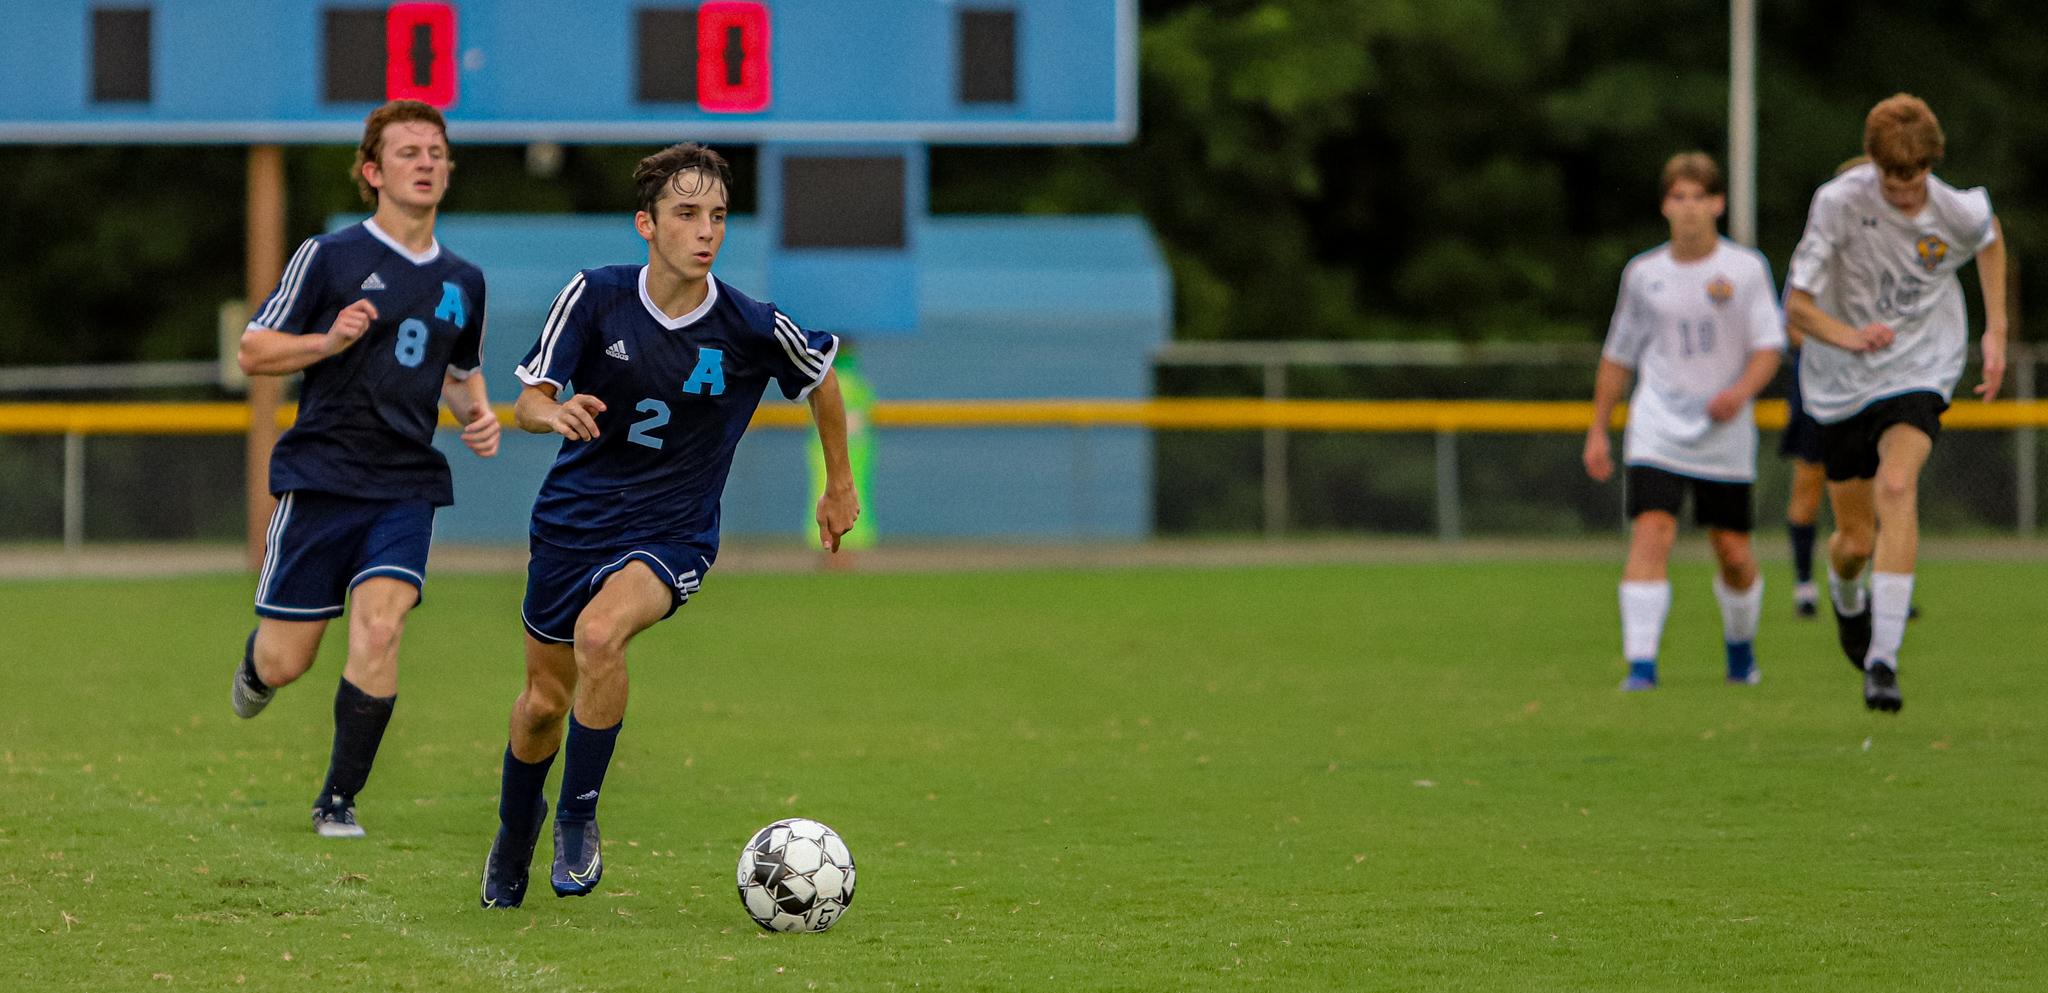 Boys Soccer: C.B. Aycock Edges Past Goldsboro (PHOTO GALLERY)